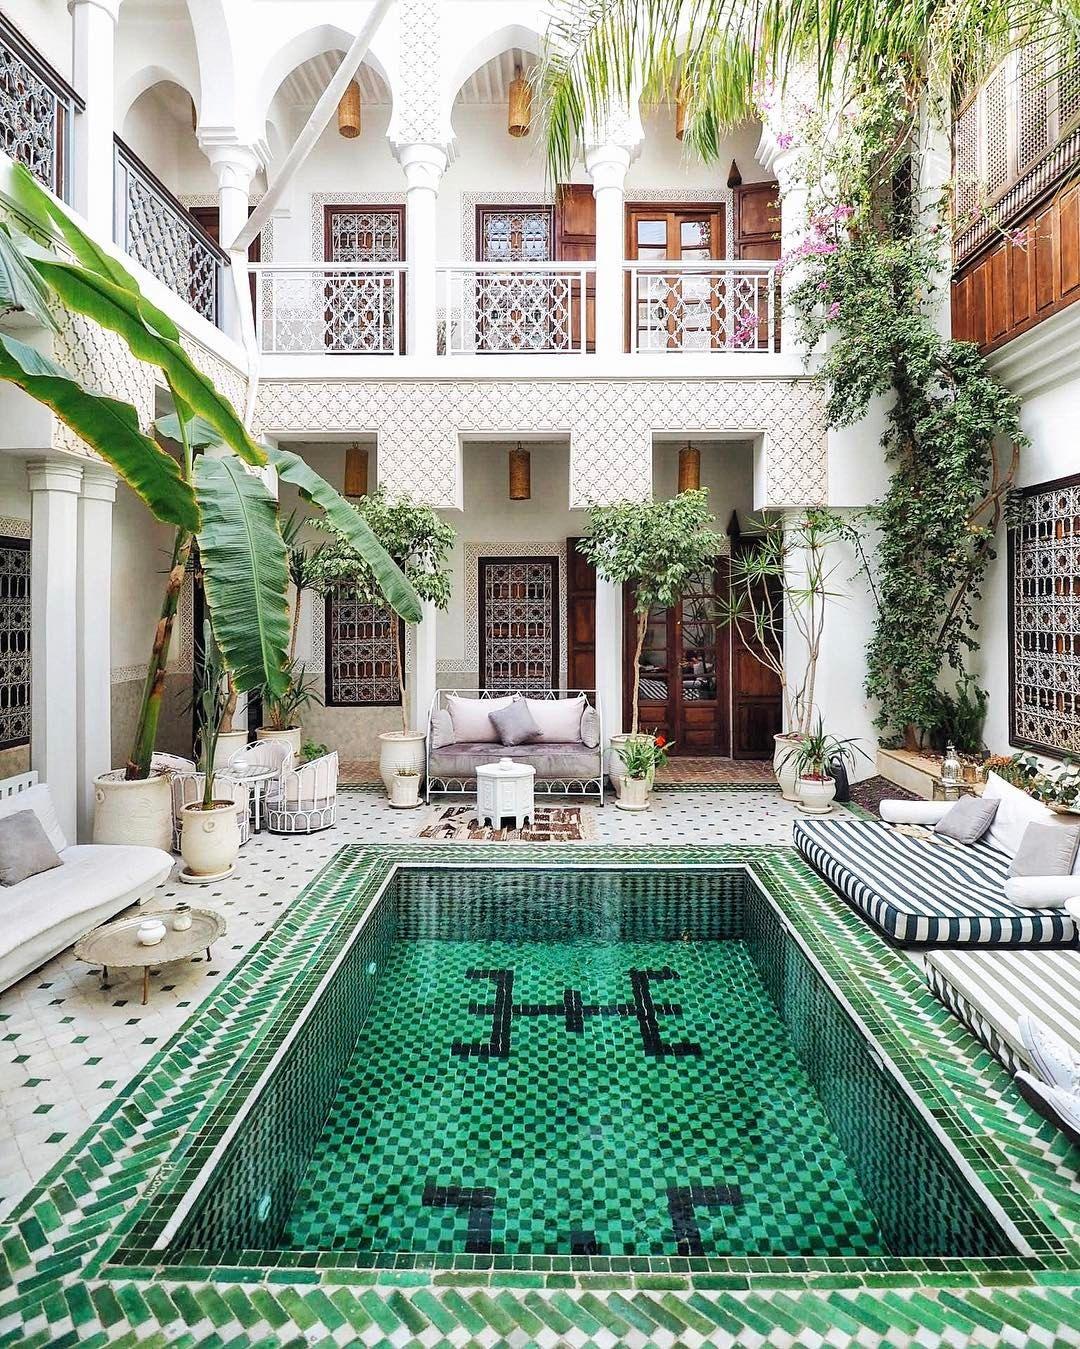 Riad Yasmine | Le riad, Riad marrakech et Maison maroc